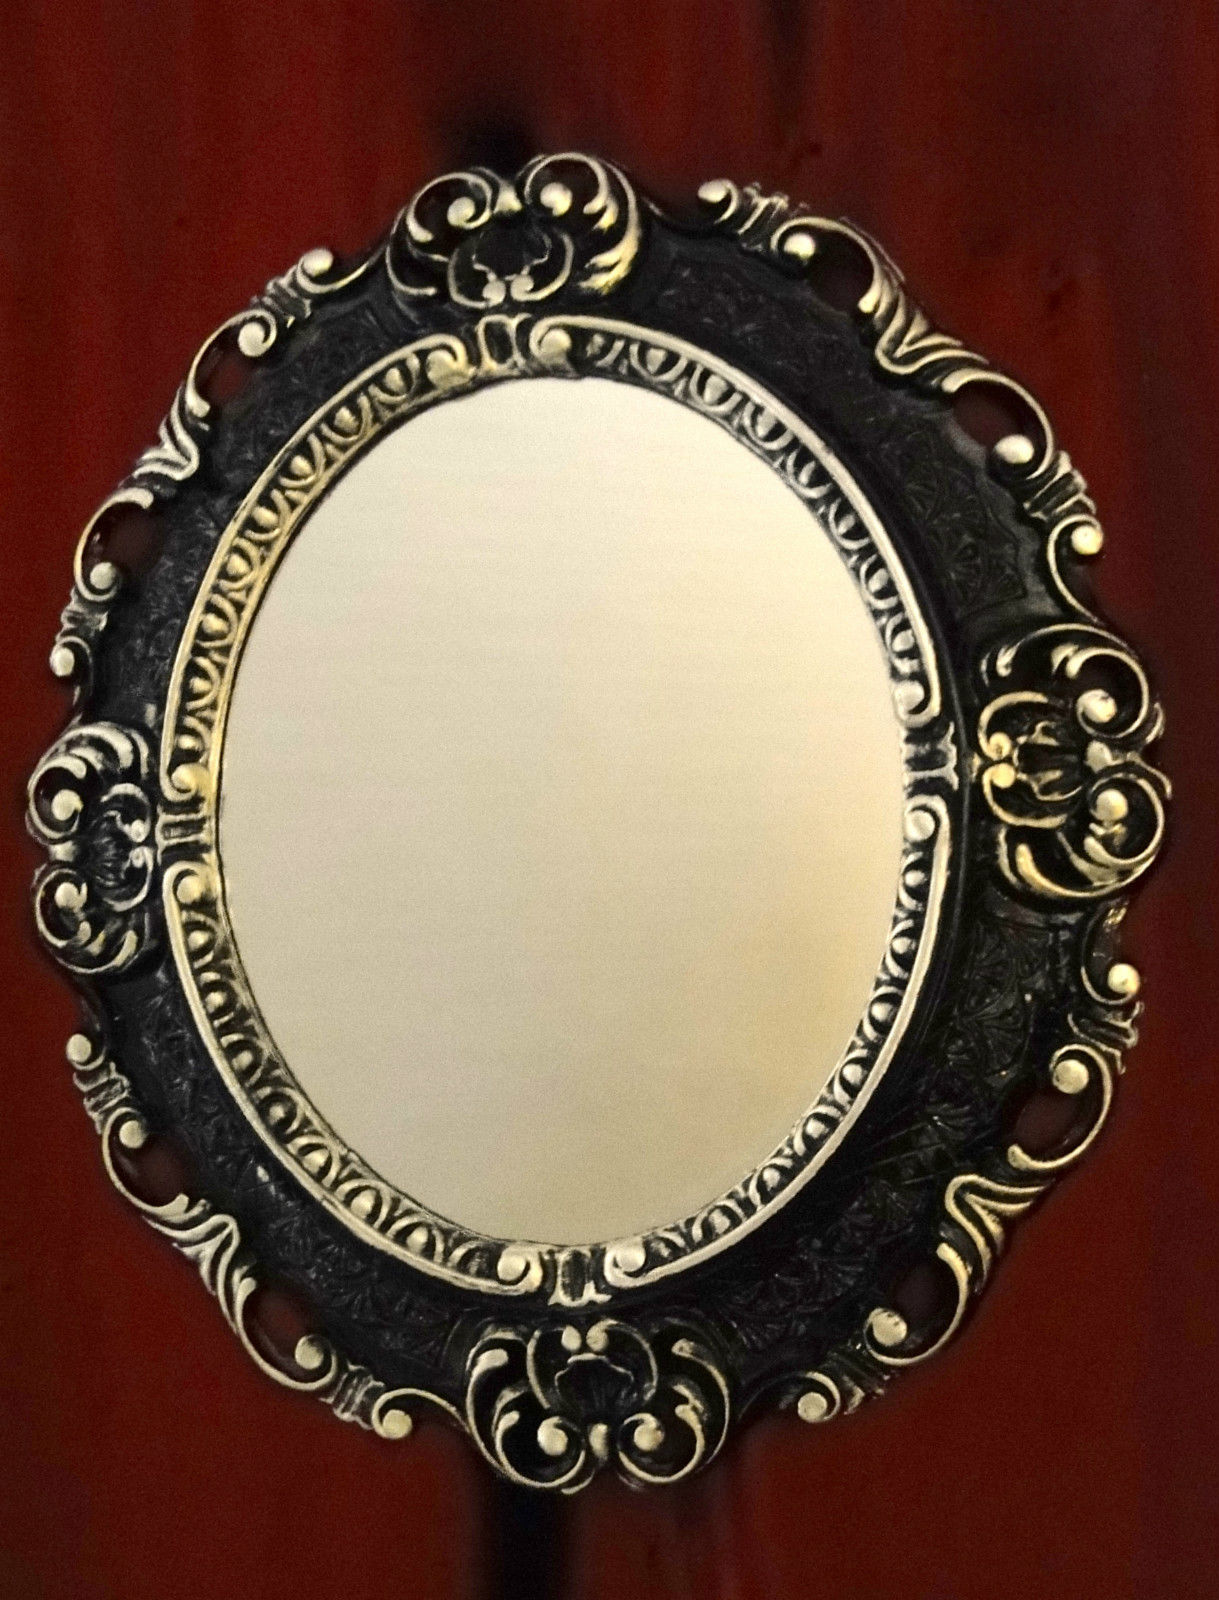 Wandspiegel Oval Antik Spiegel Schwarz Silber Barock Badspiegel ...